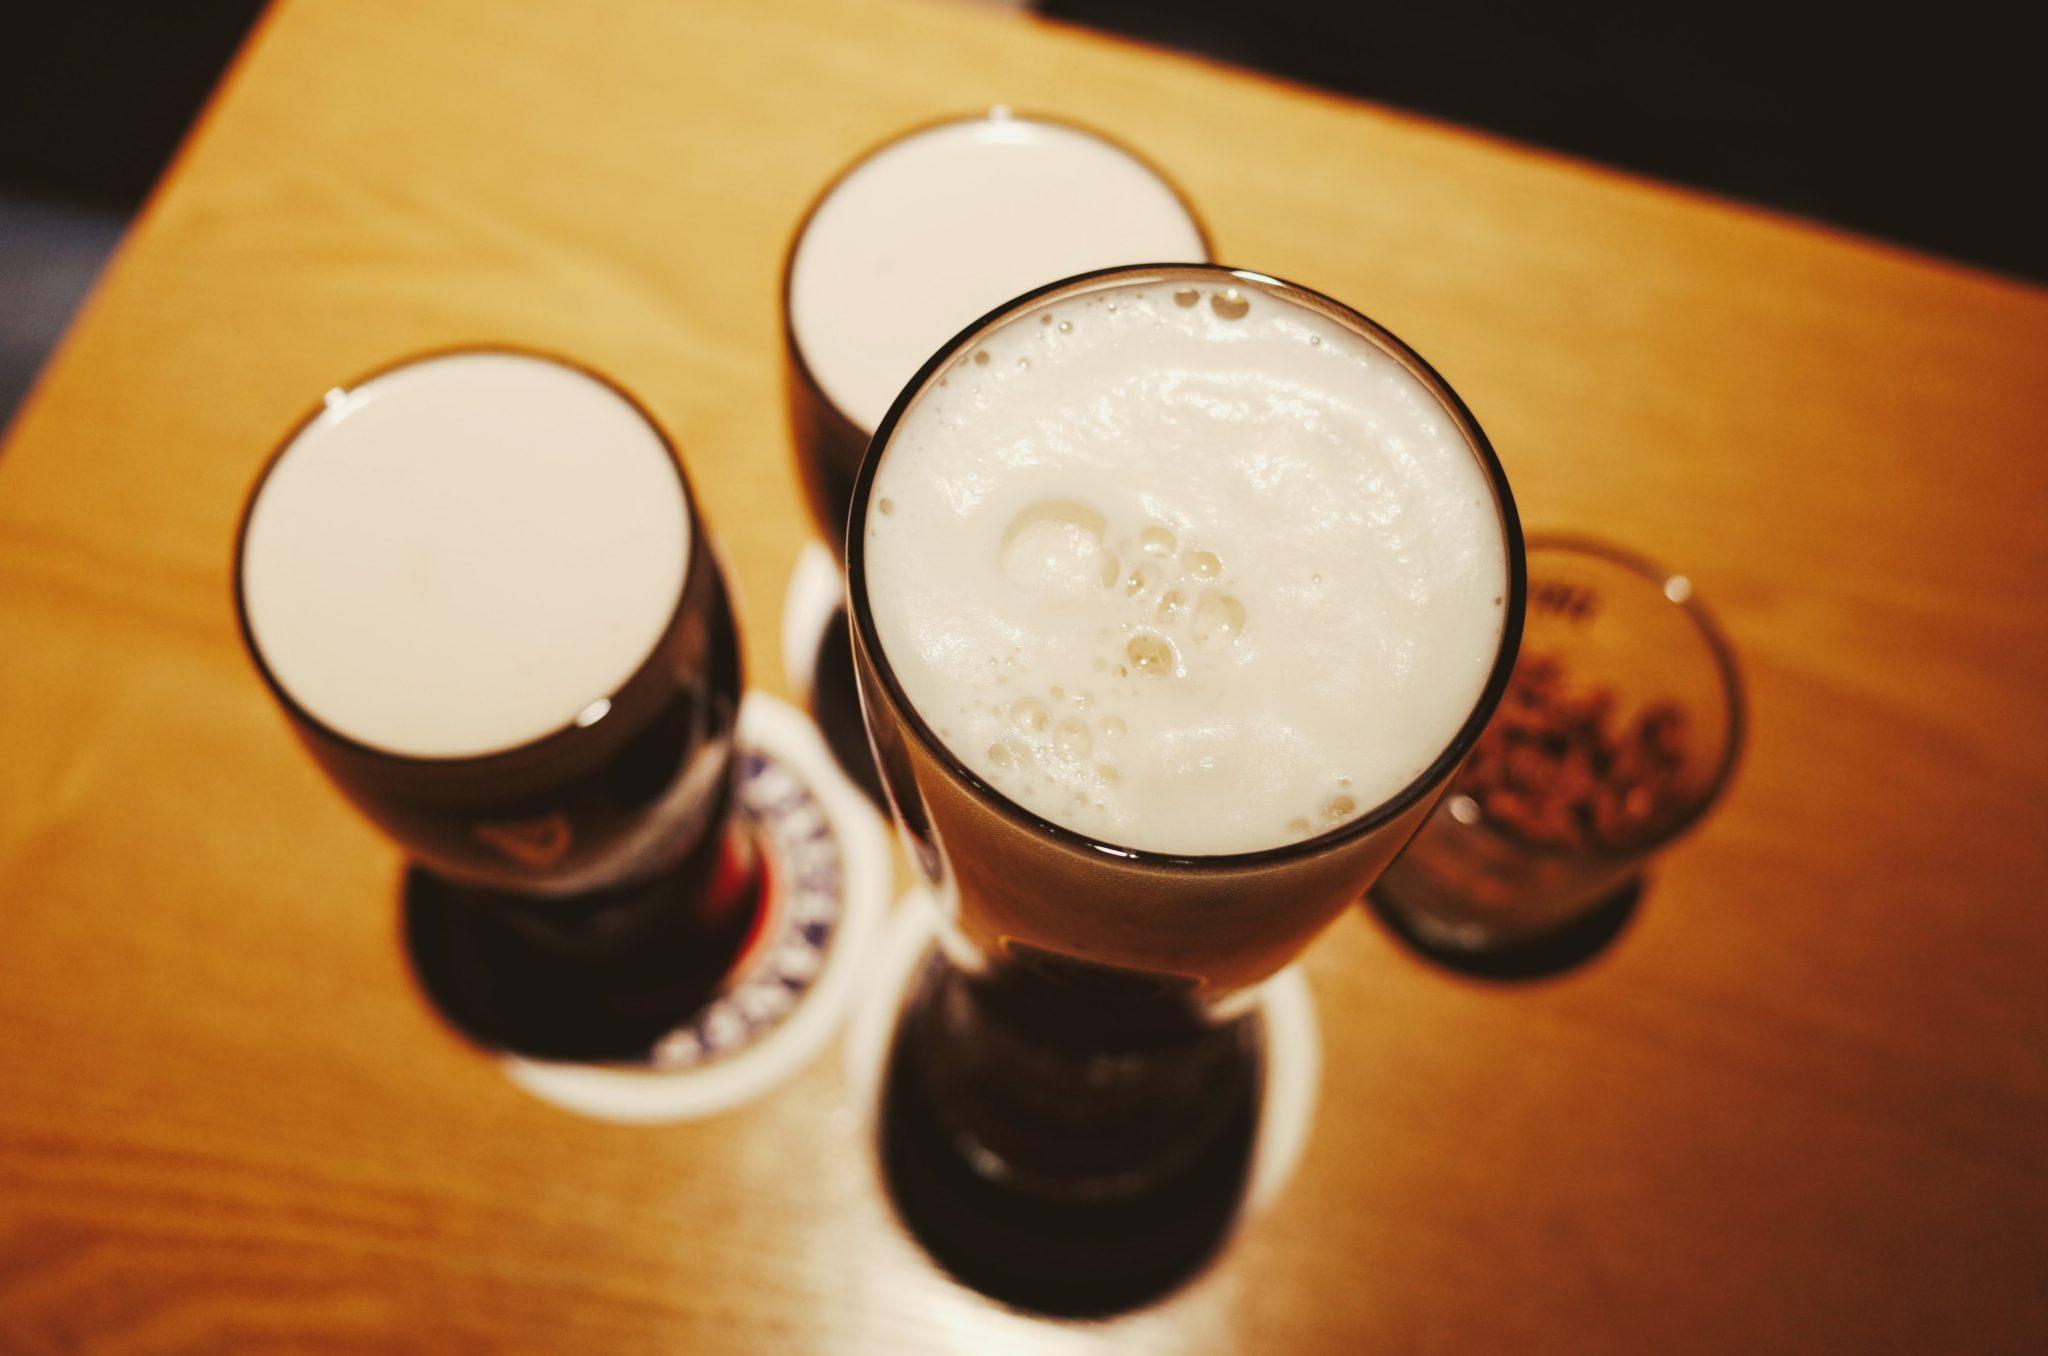 beer-blur-close-up-250465